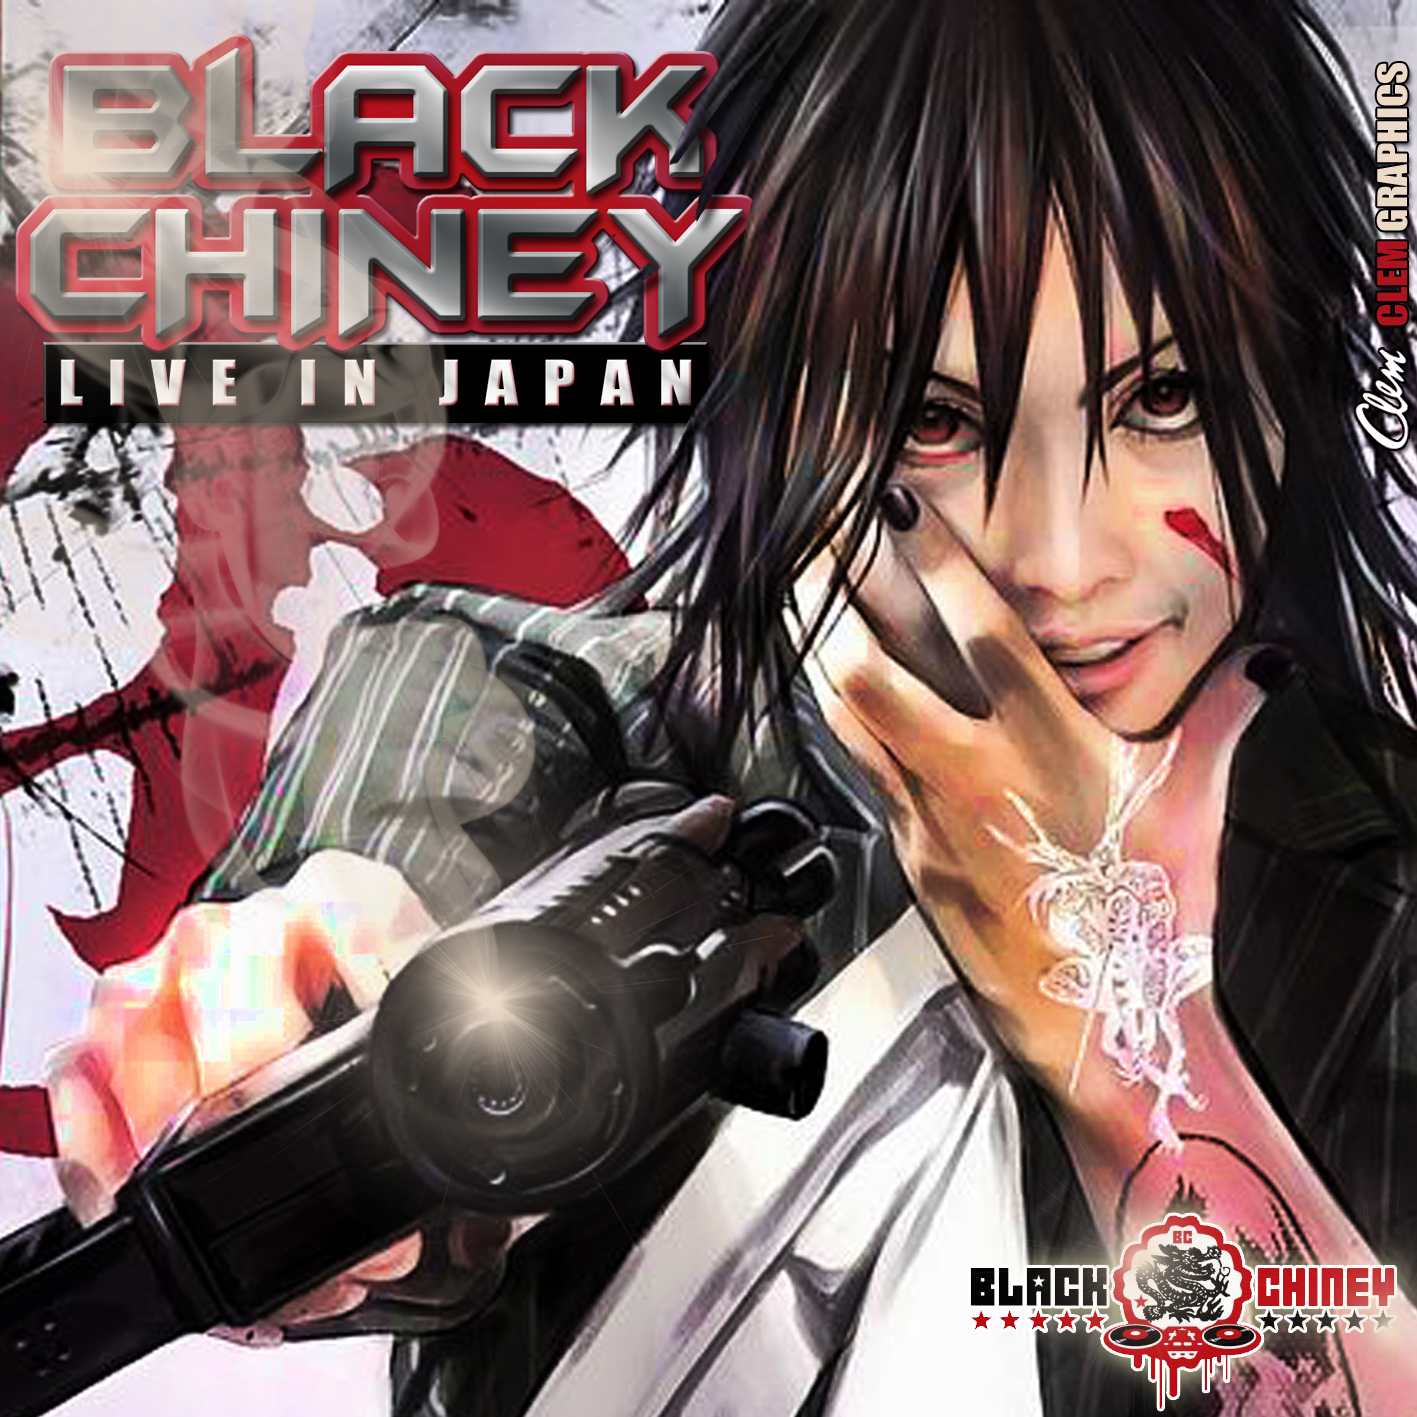 BLACK-CHINEY-LIVE-IN-JAPAN.jpg